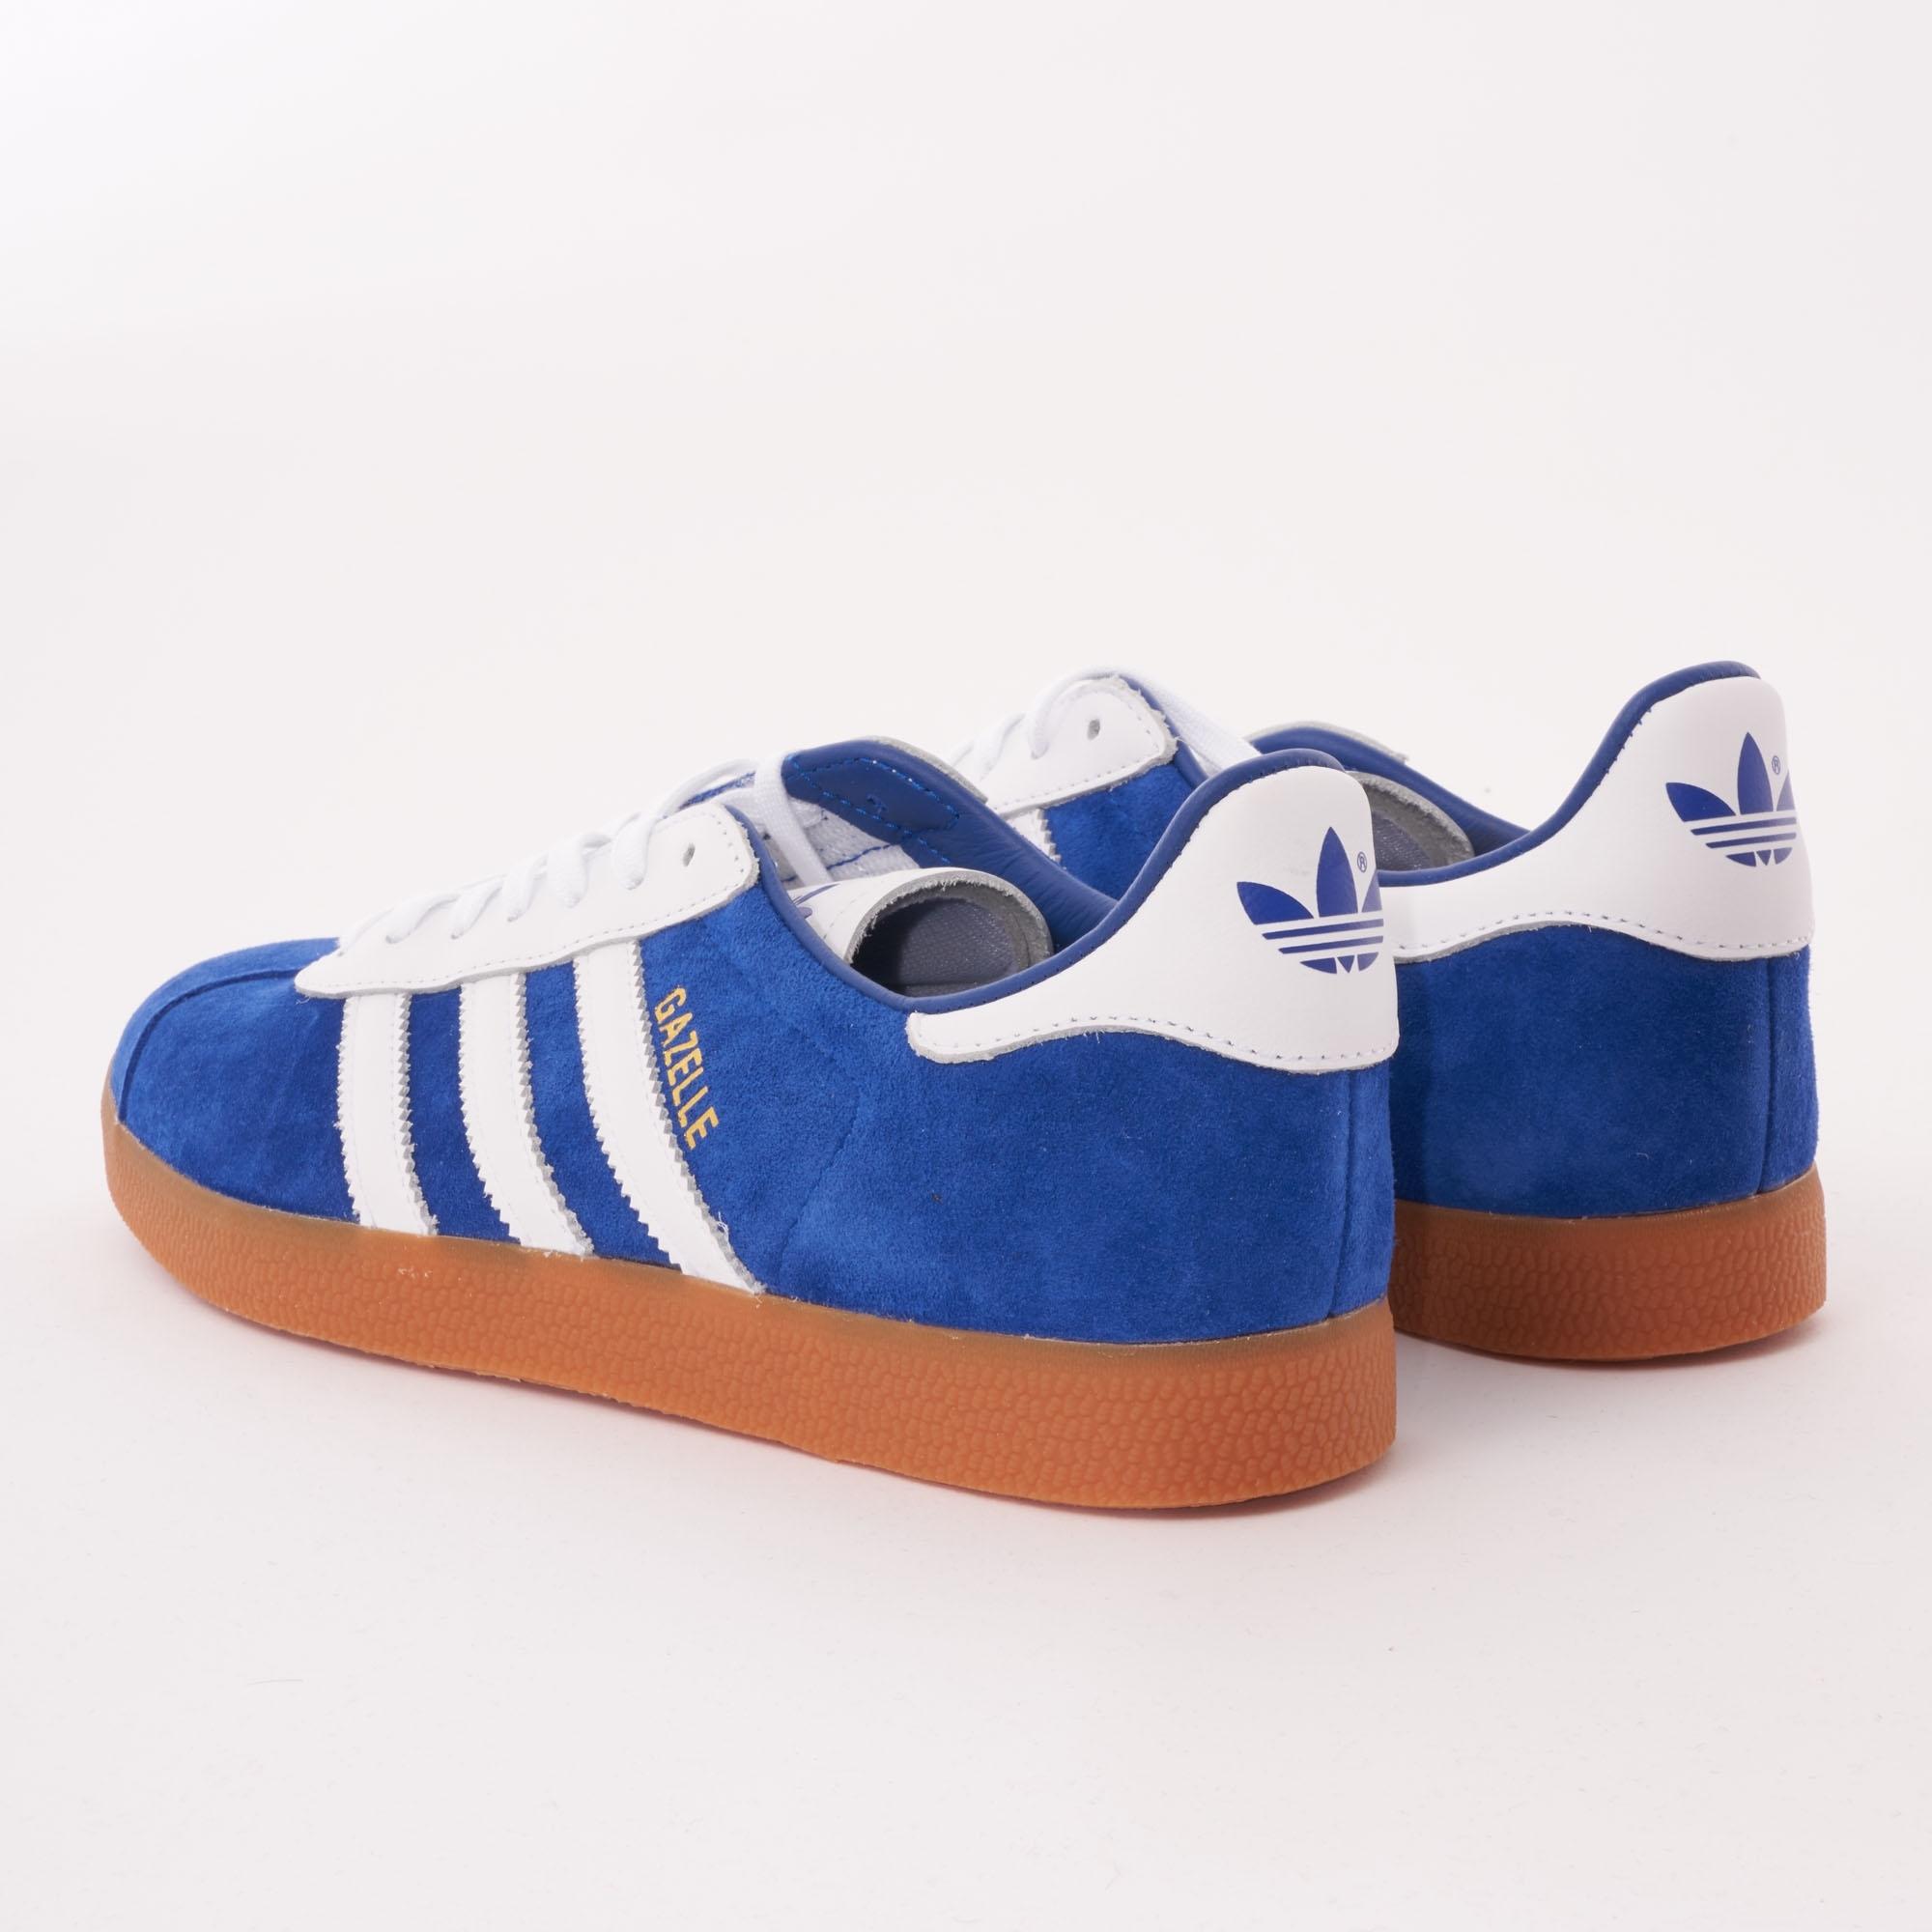 Adidas Originals Gazelle - Royal Blue & FTW White